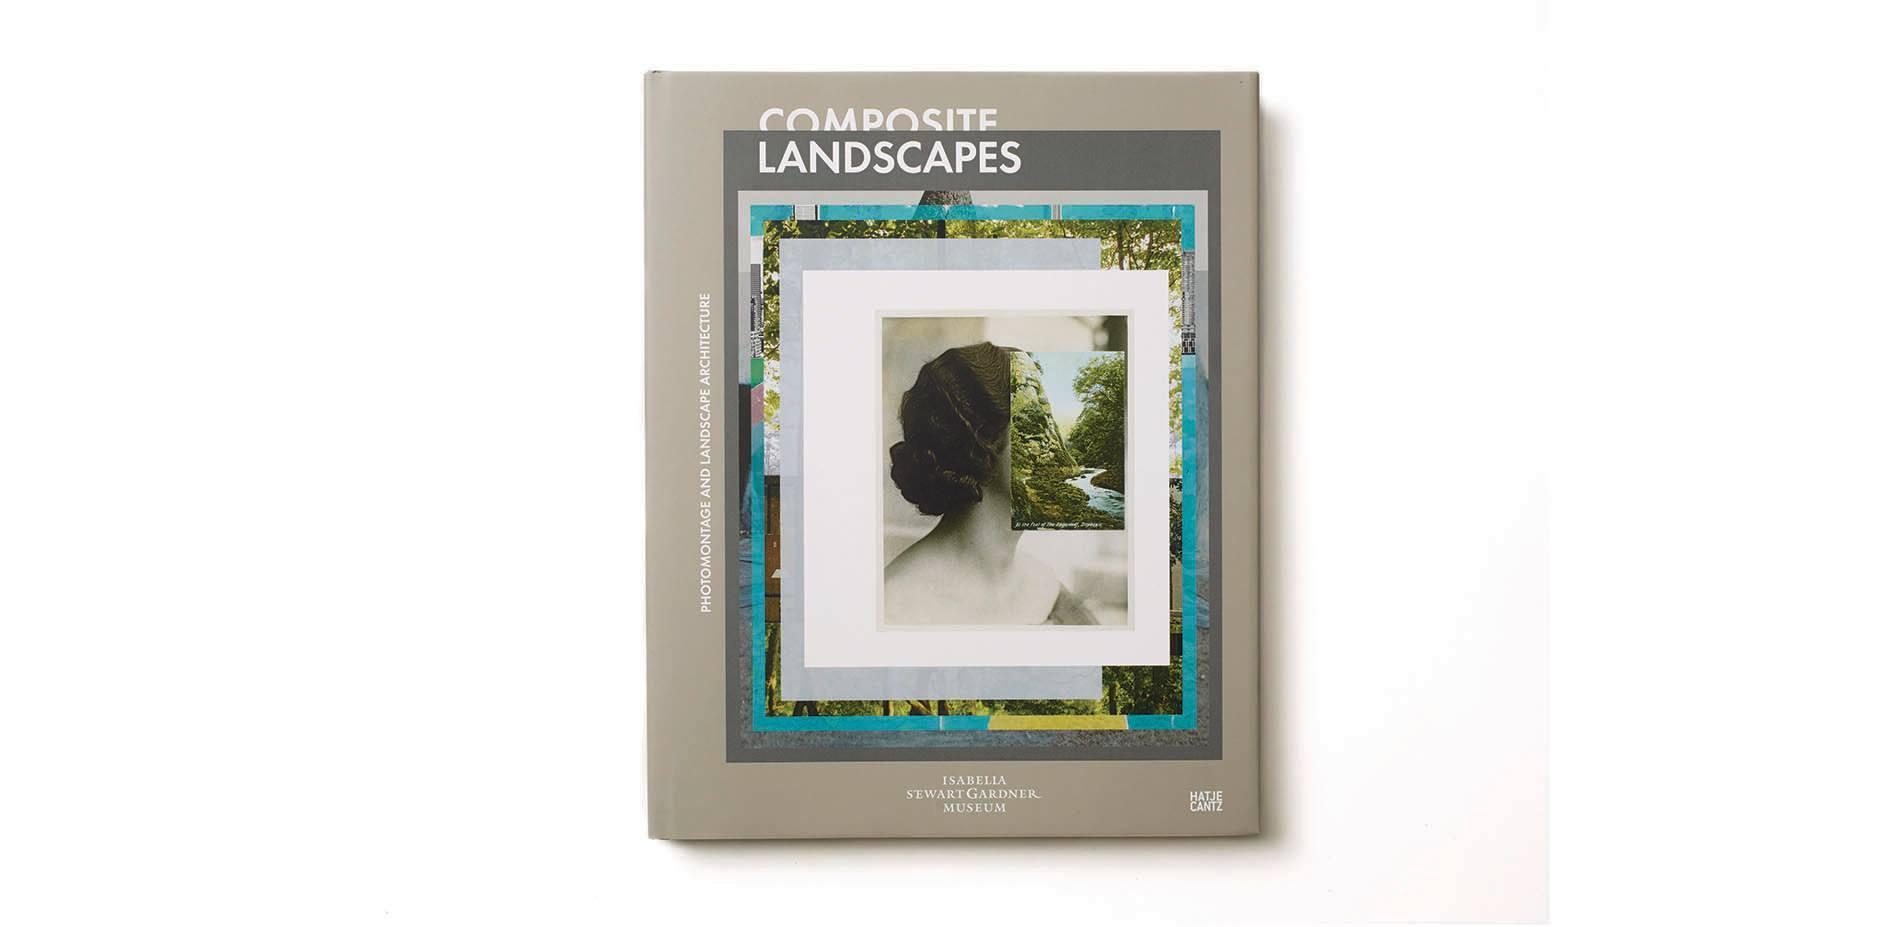 Composite Landscapes Photomontage And Landscape Architecture 2015 Asla Professional Awards